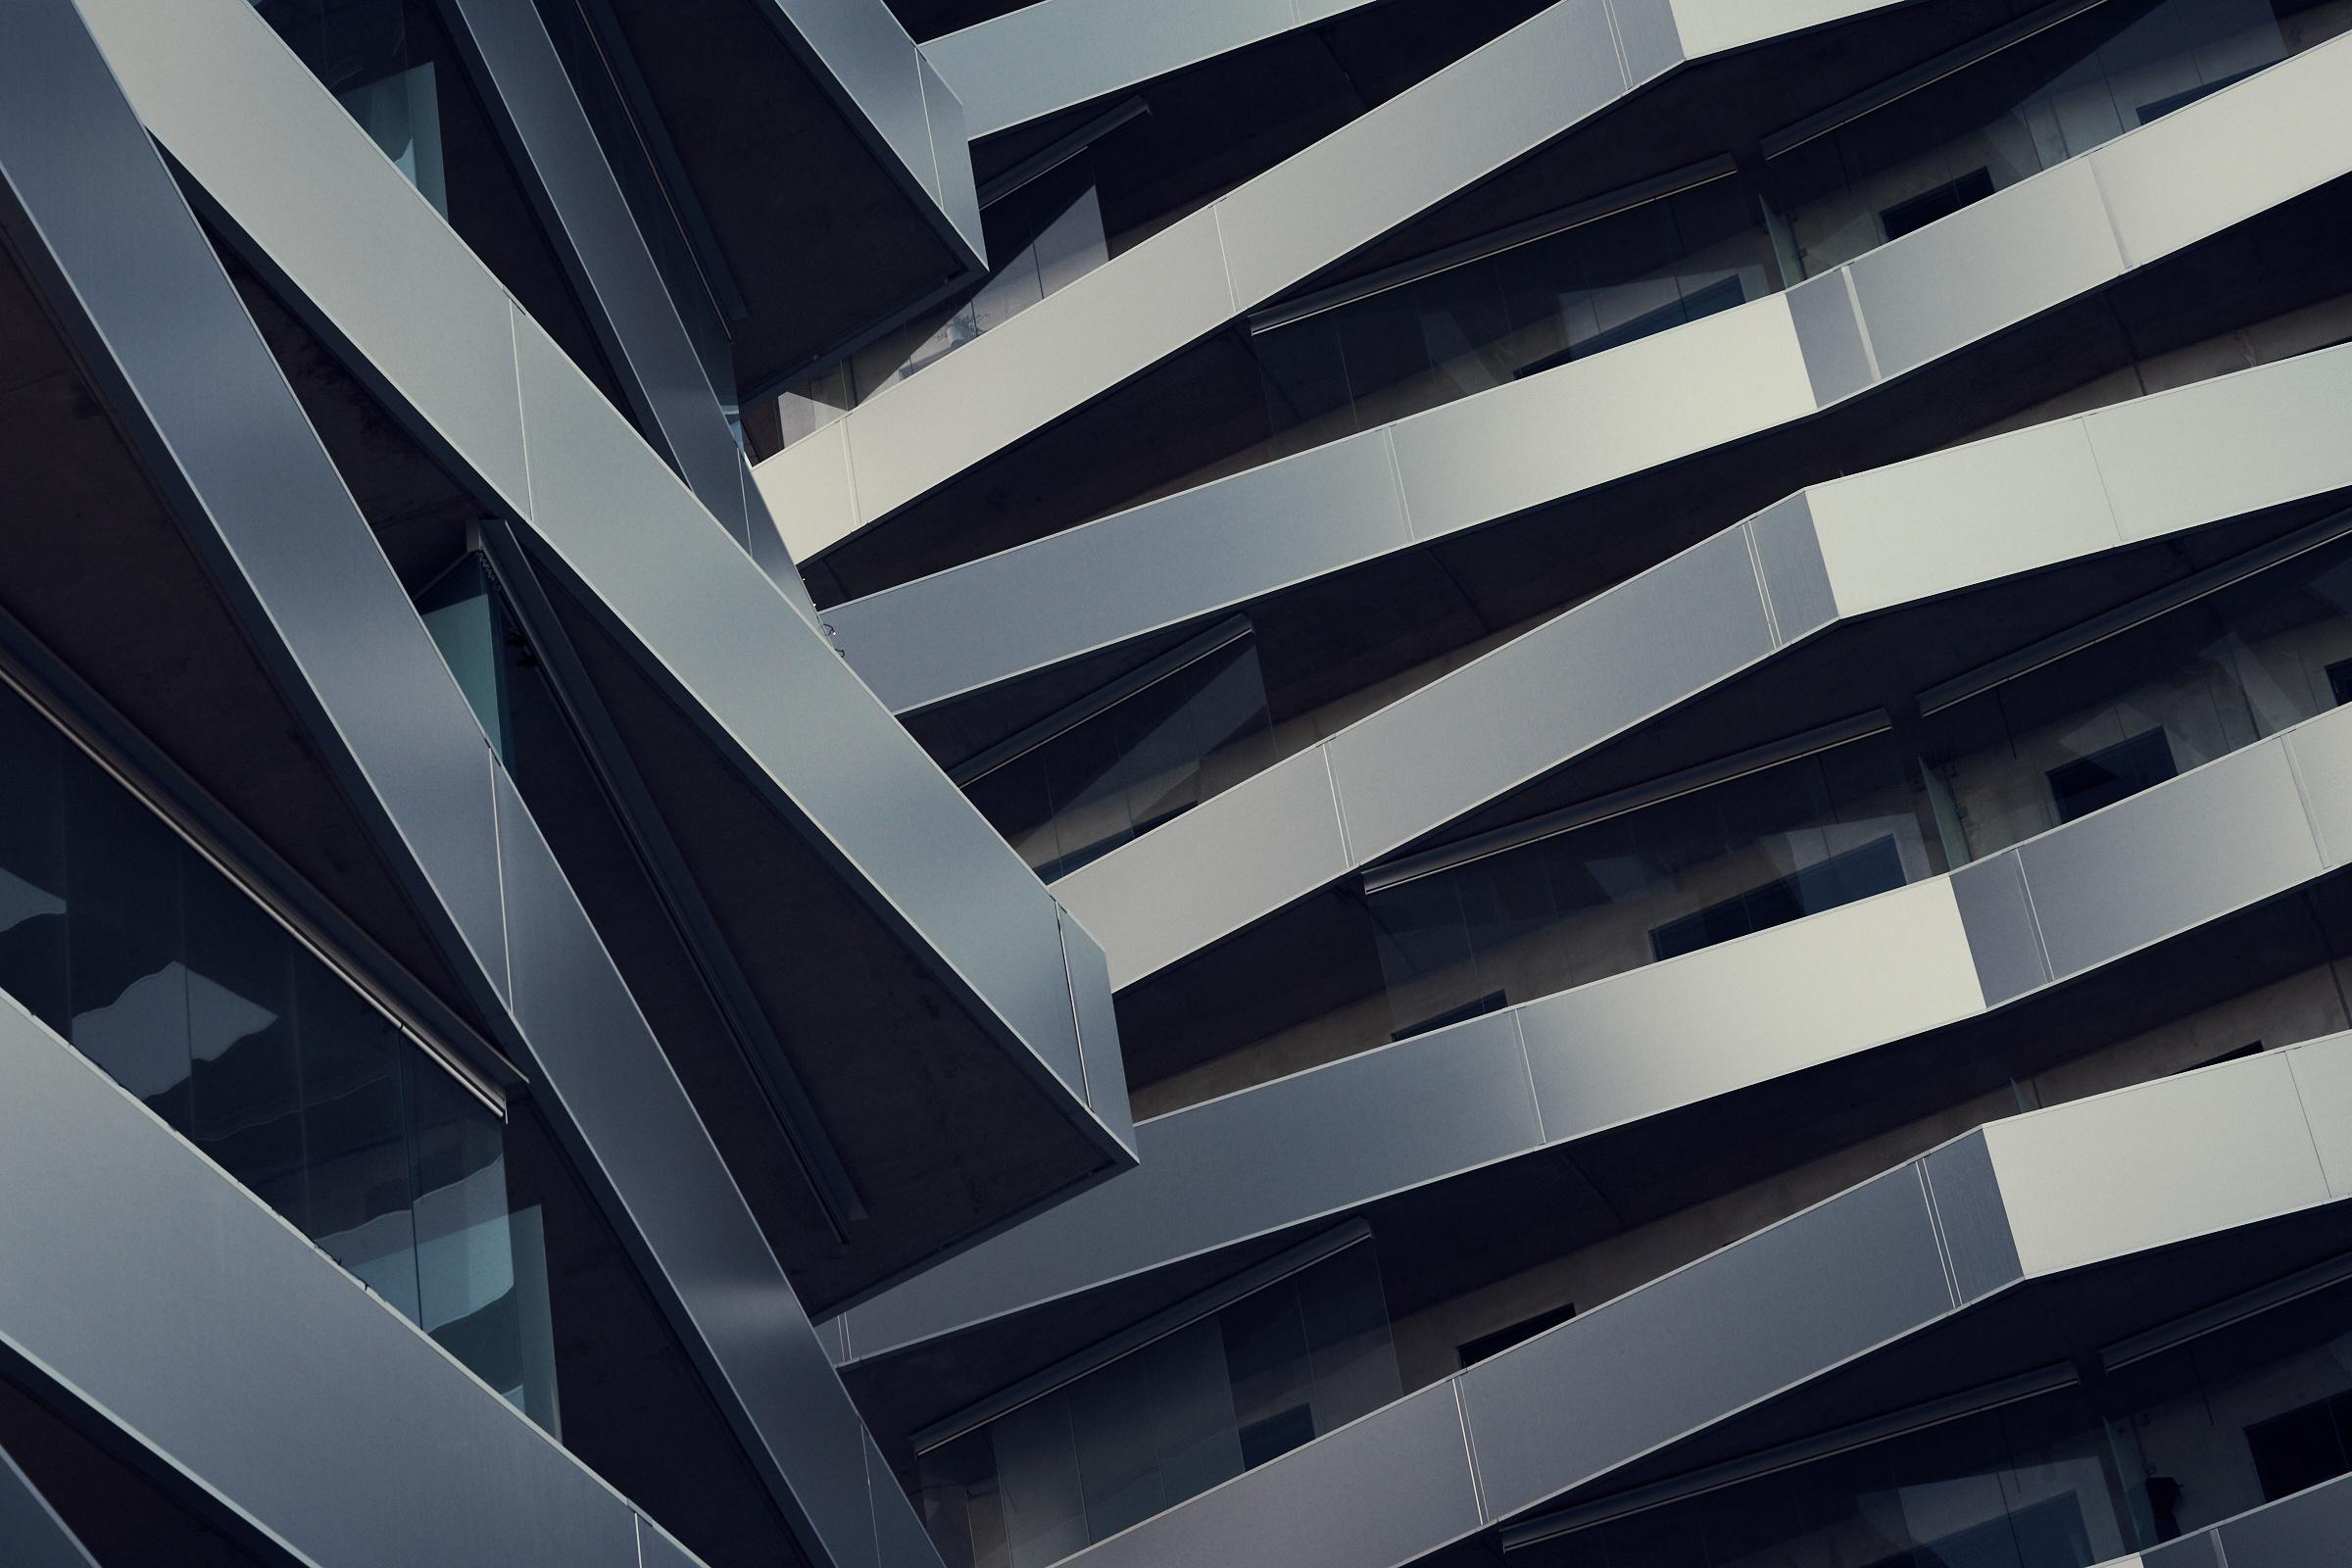 Master systems integrators smart buildings